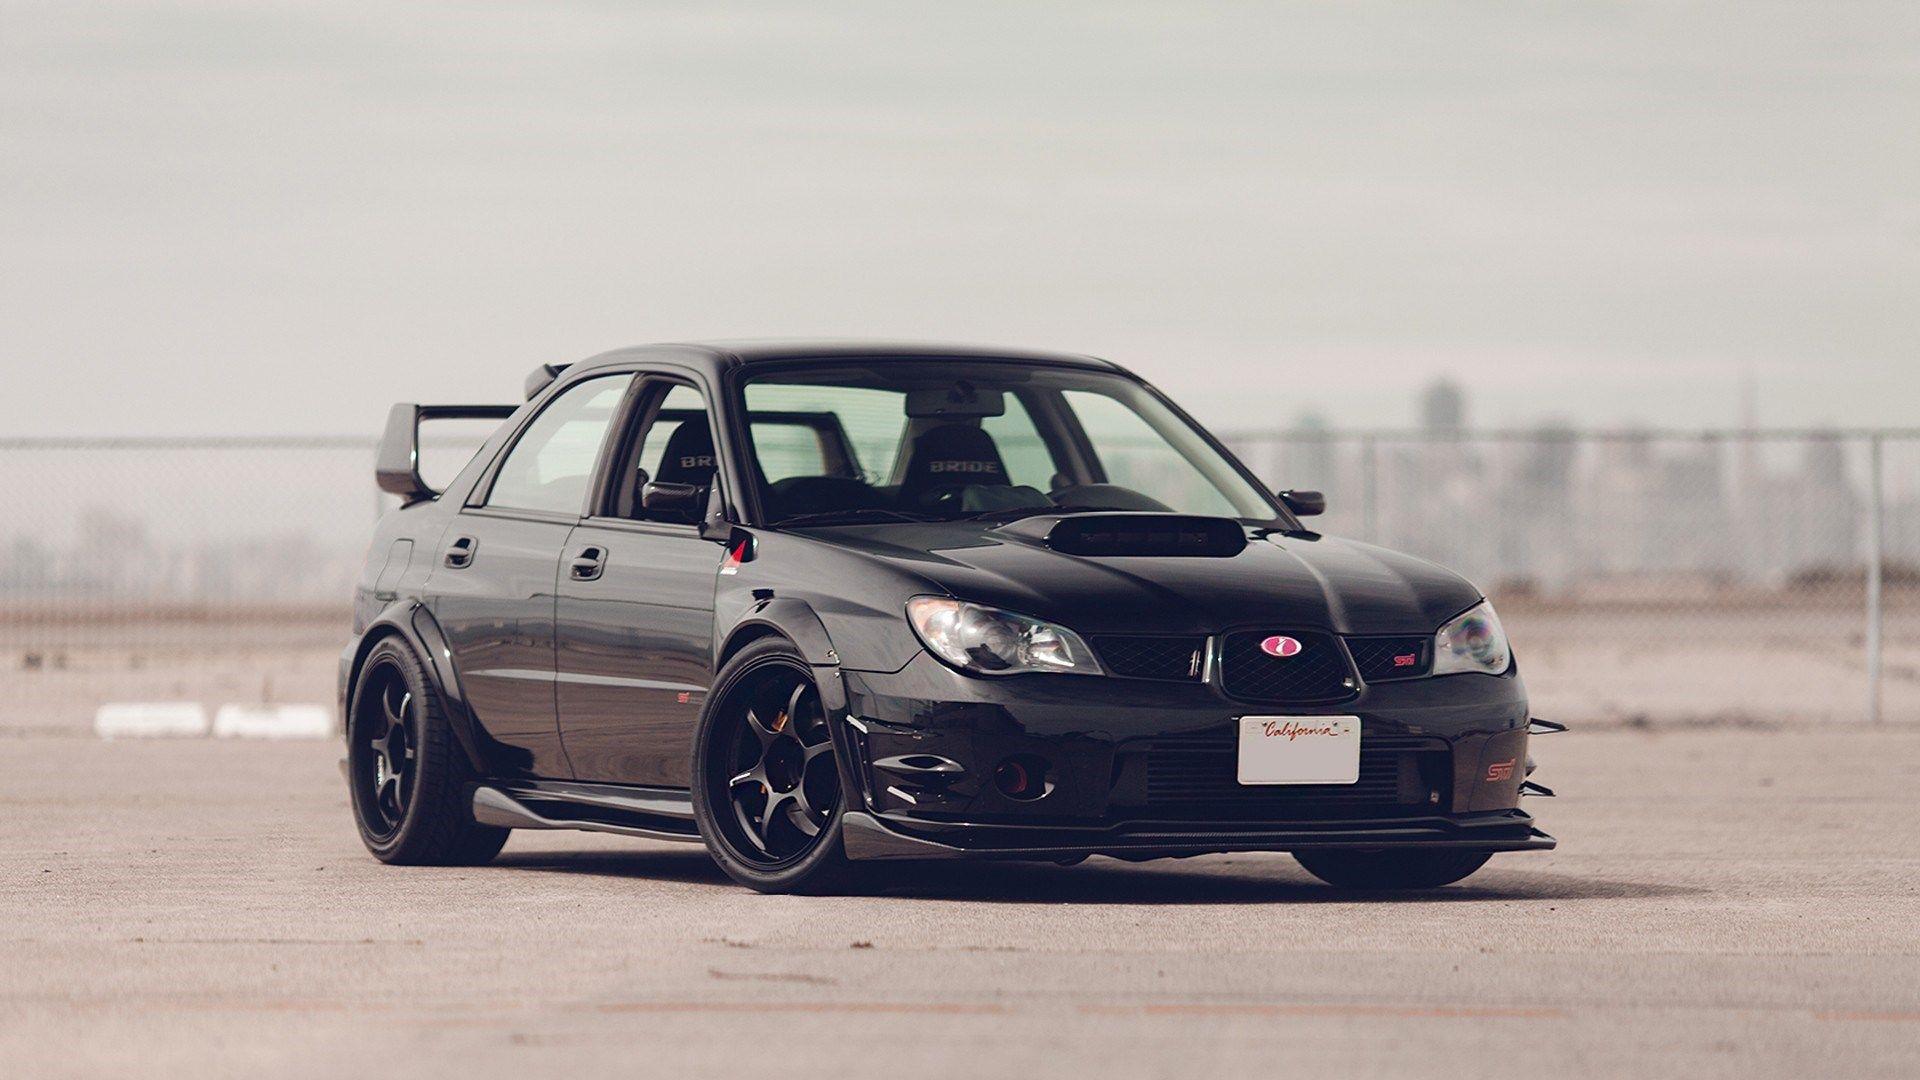 Subaru Wrx Hd Wallpaper